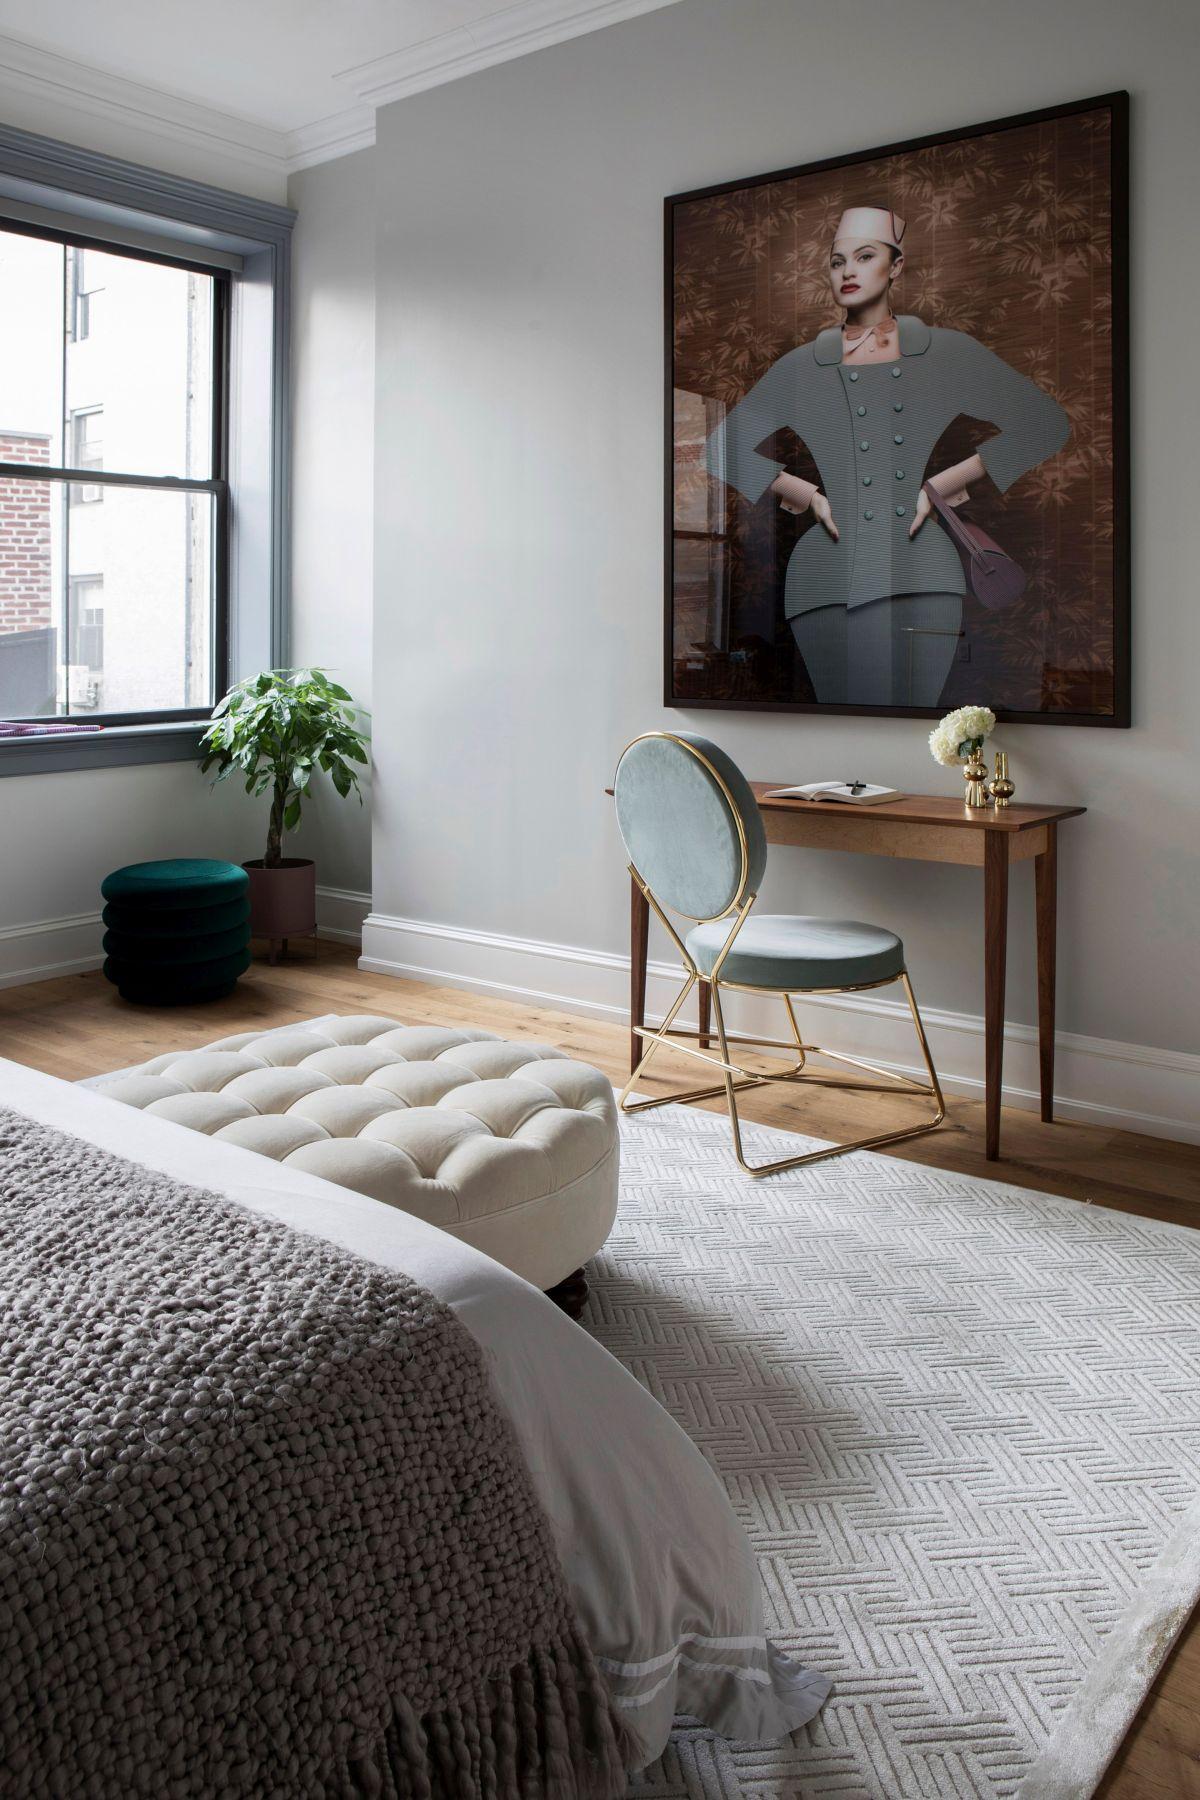 Stylish Laconic And Functional New York Loft Style: This Soho Loft Is Designed For Entertaining And A Stylish